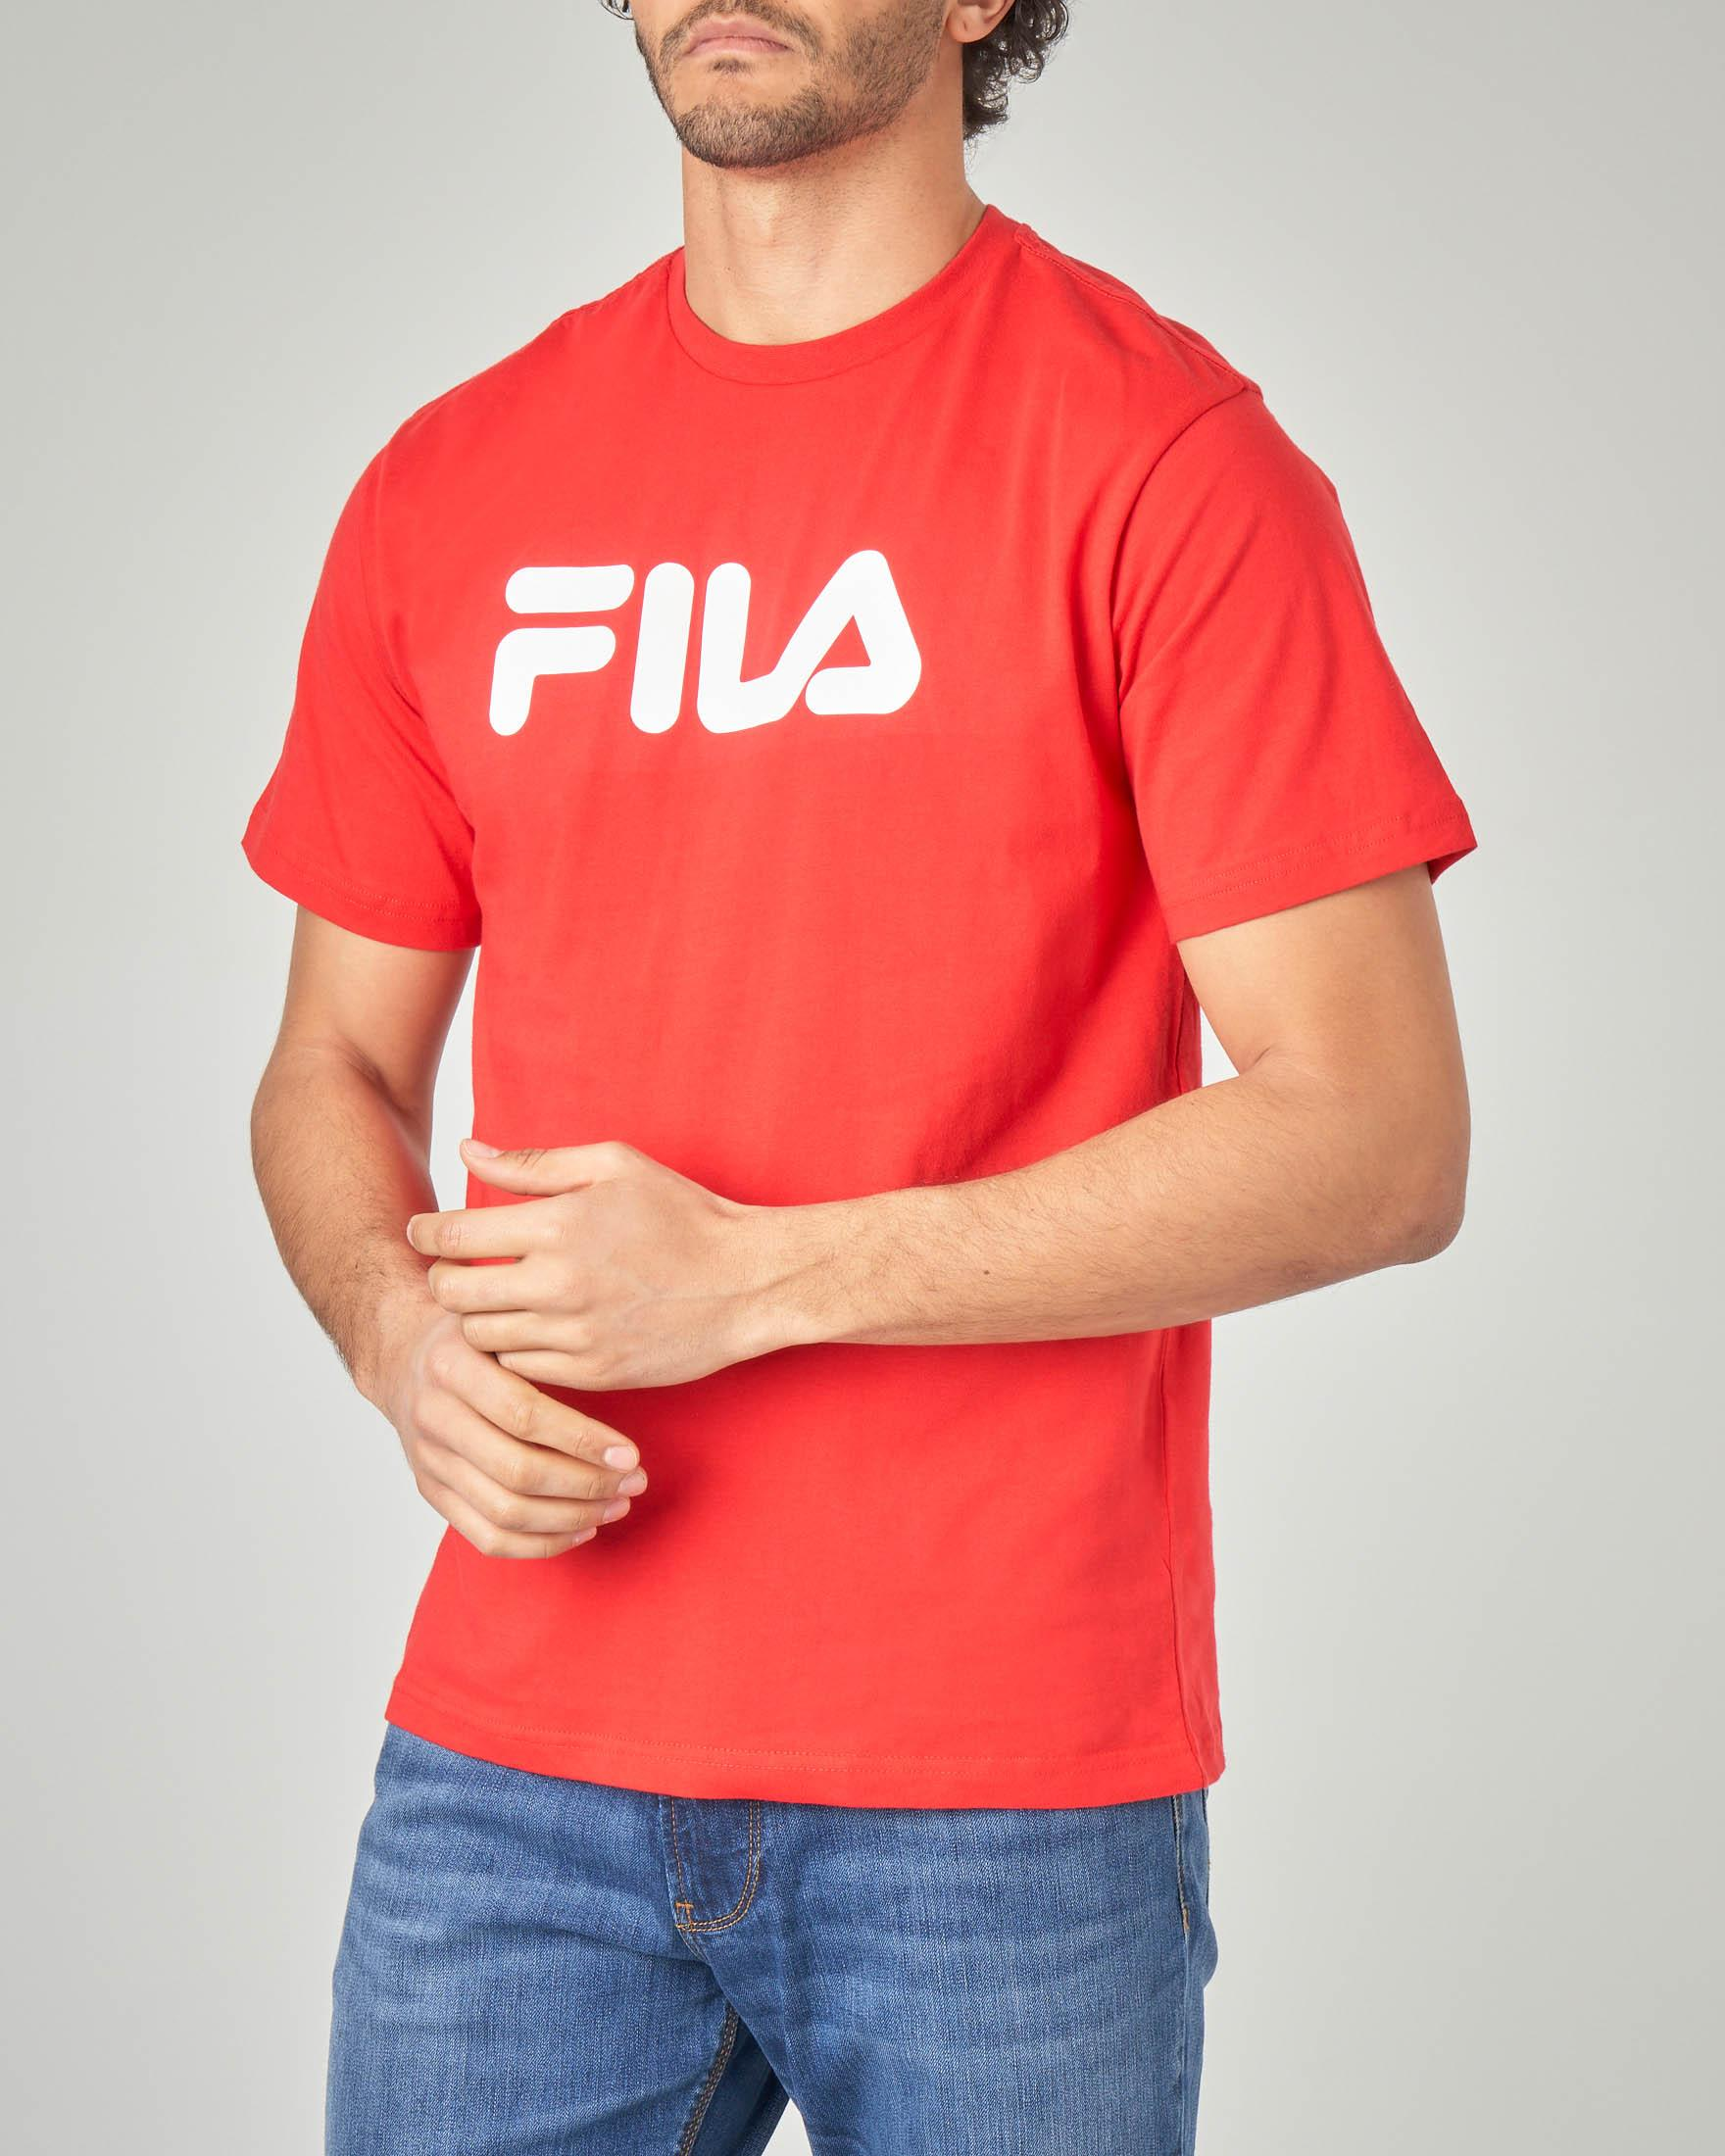 T-shirt rossa con logo